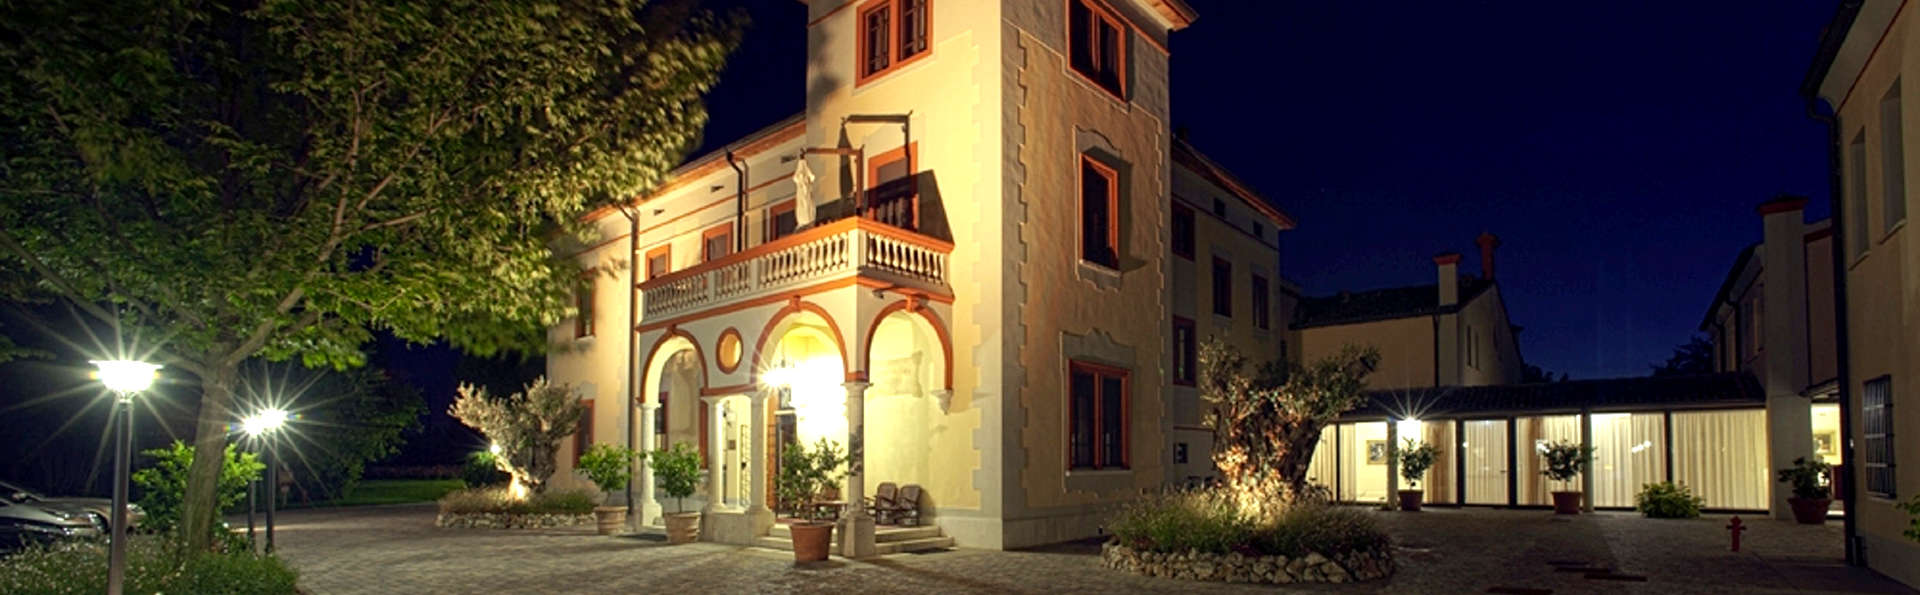 Hotel Villa Dei Tigli 920 Liberty Resort - Edit_Front.jpg